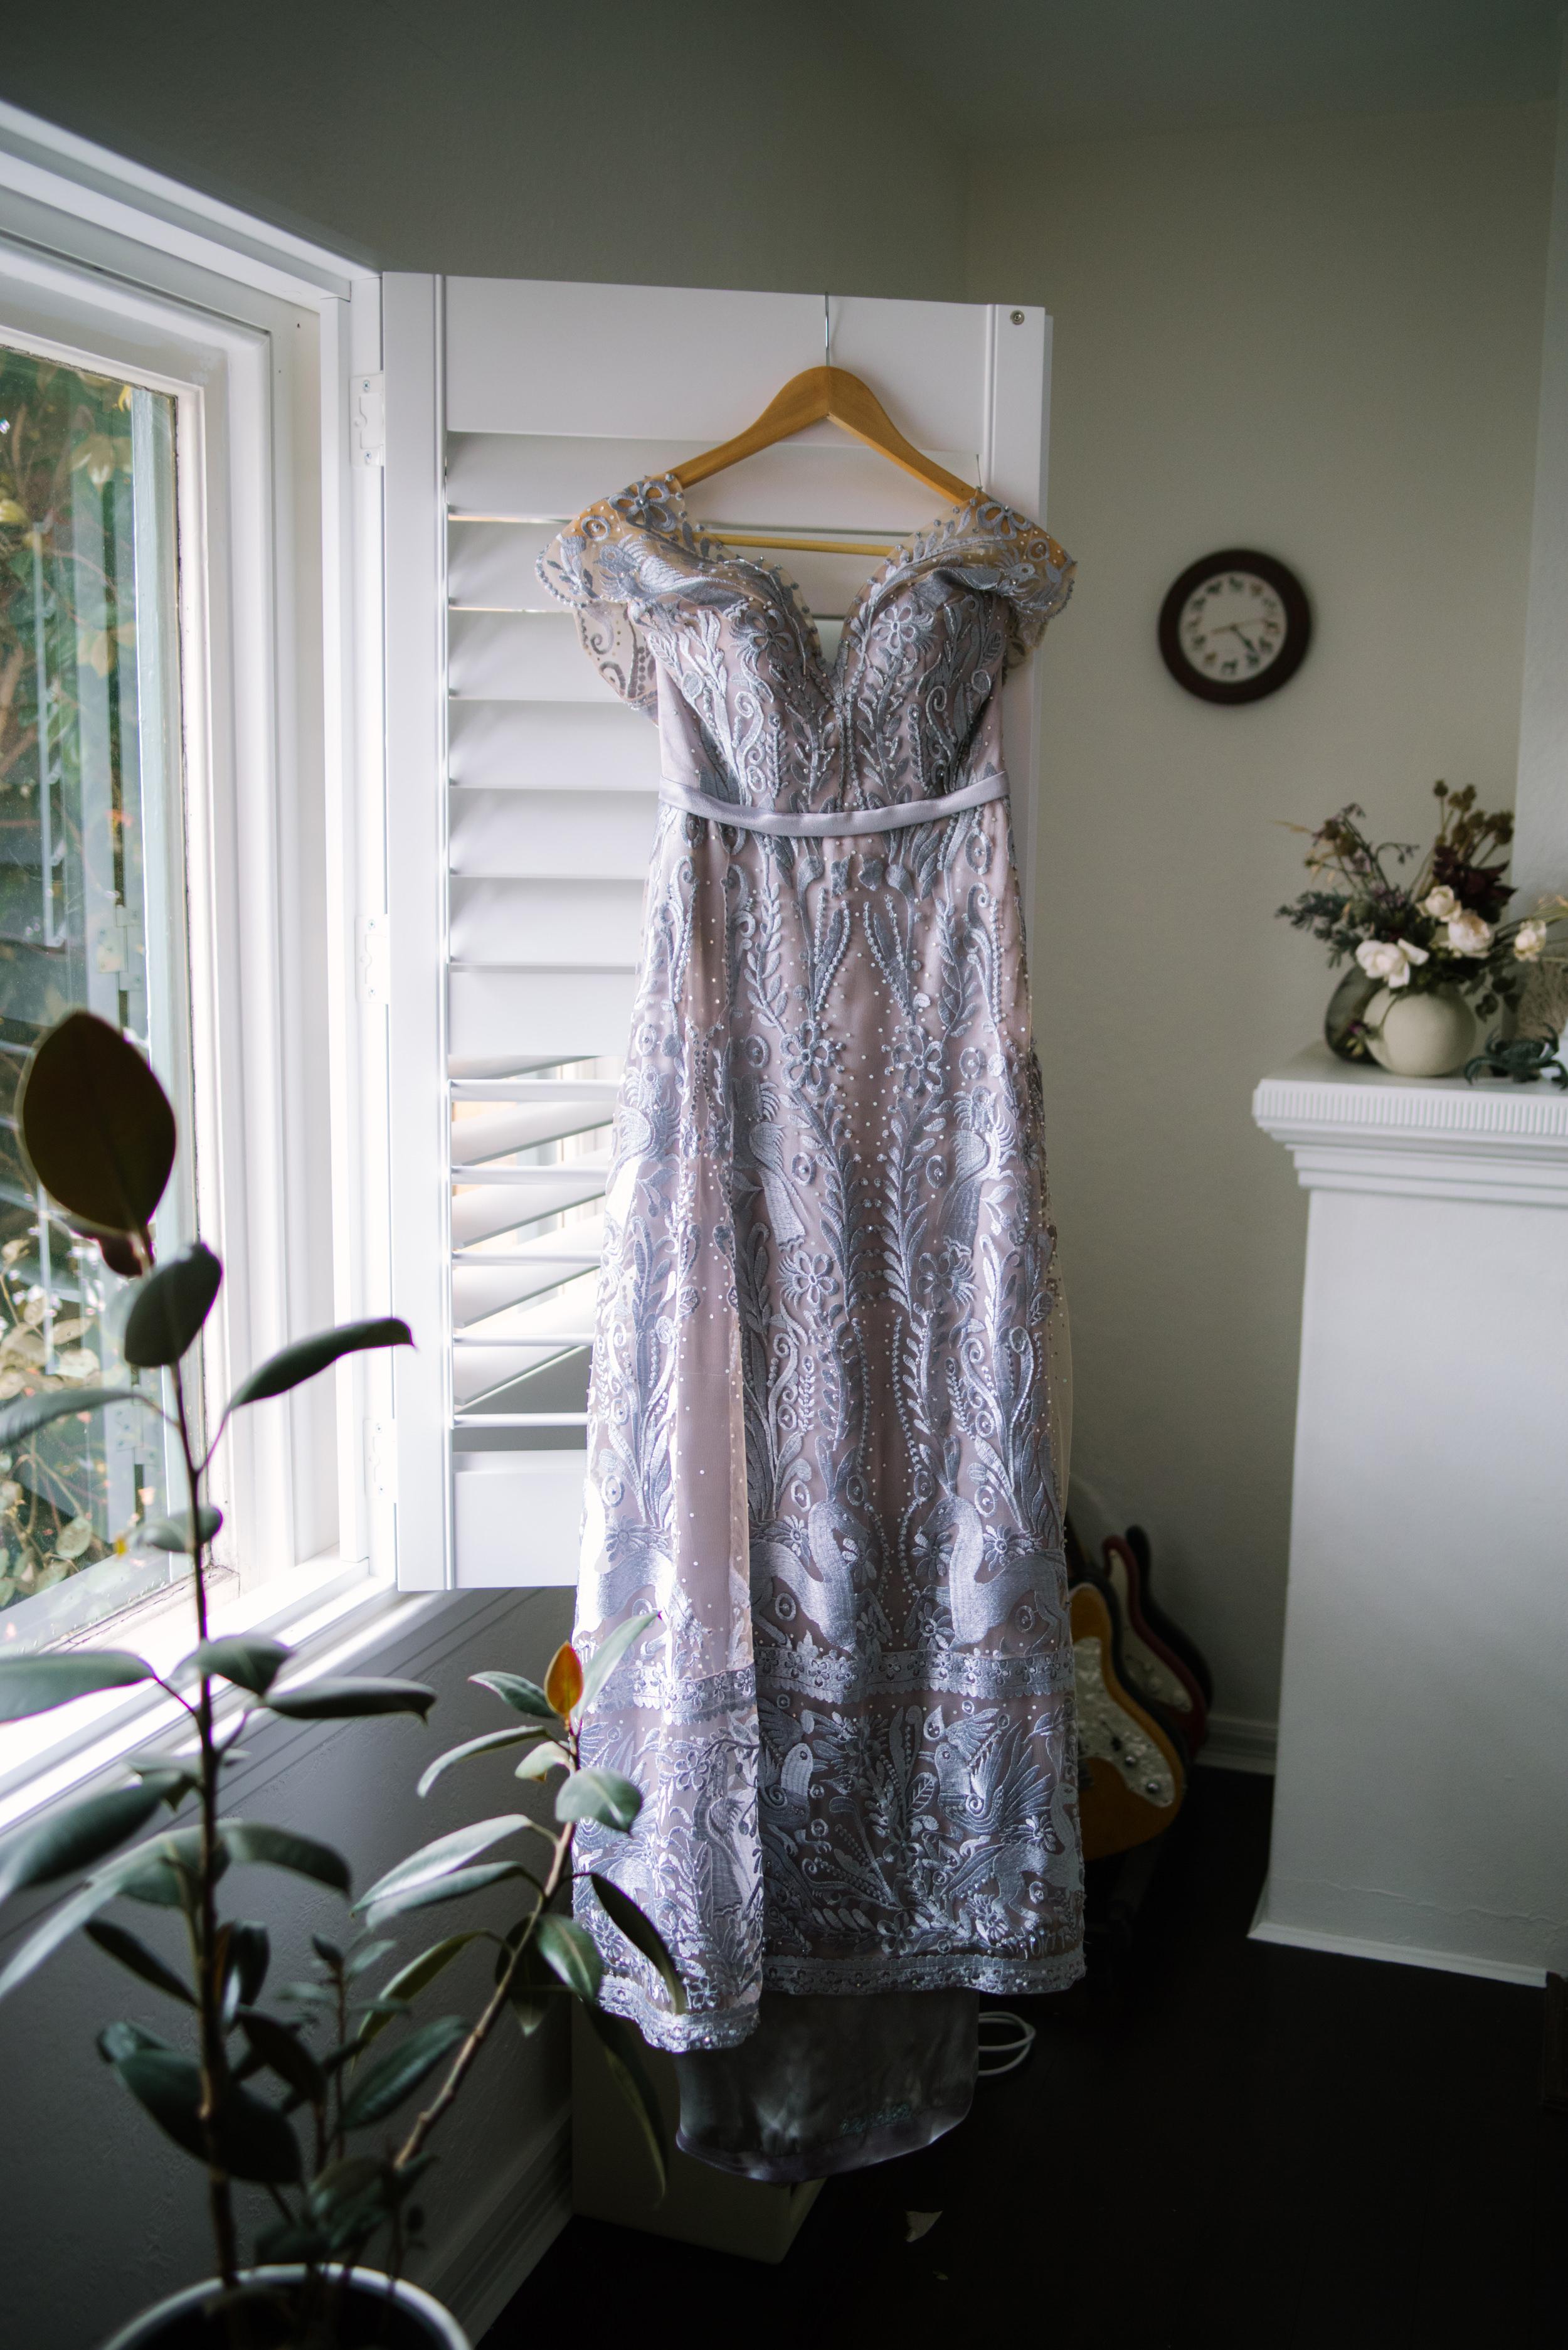 I-Got-You-Babe-&.Co.-Glasshaus-Wedding-Charlotte-Cameron0010.JPG